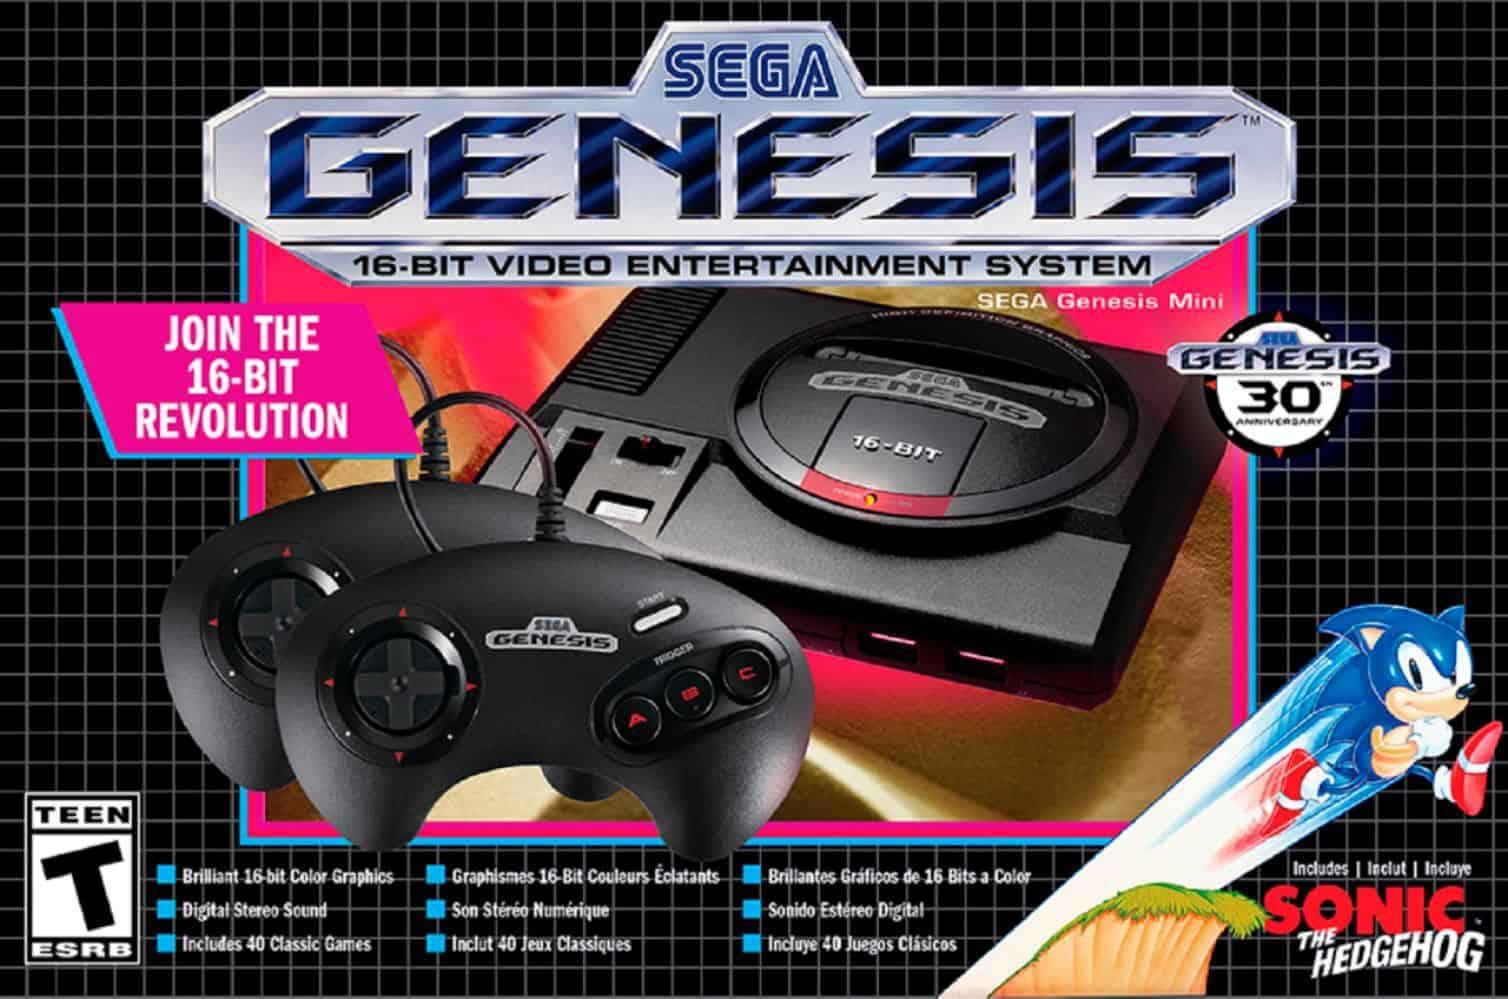 SEGA Genesis Mini Console - gifts for teen boys